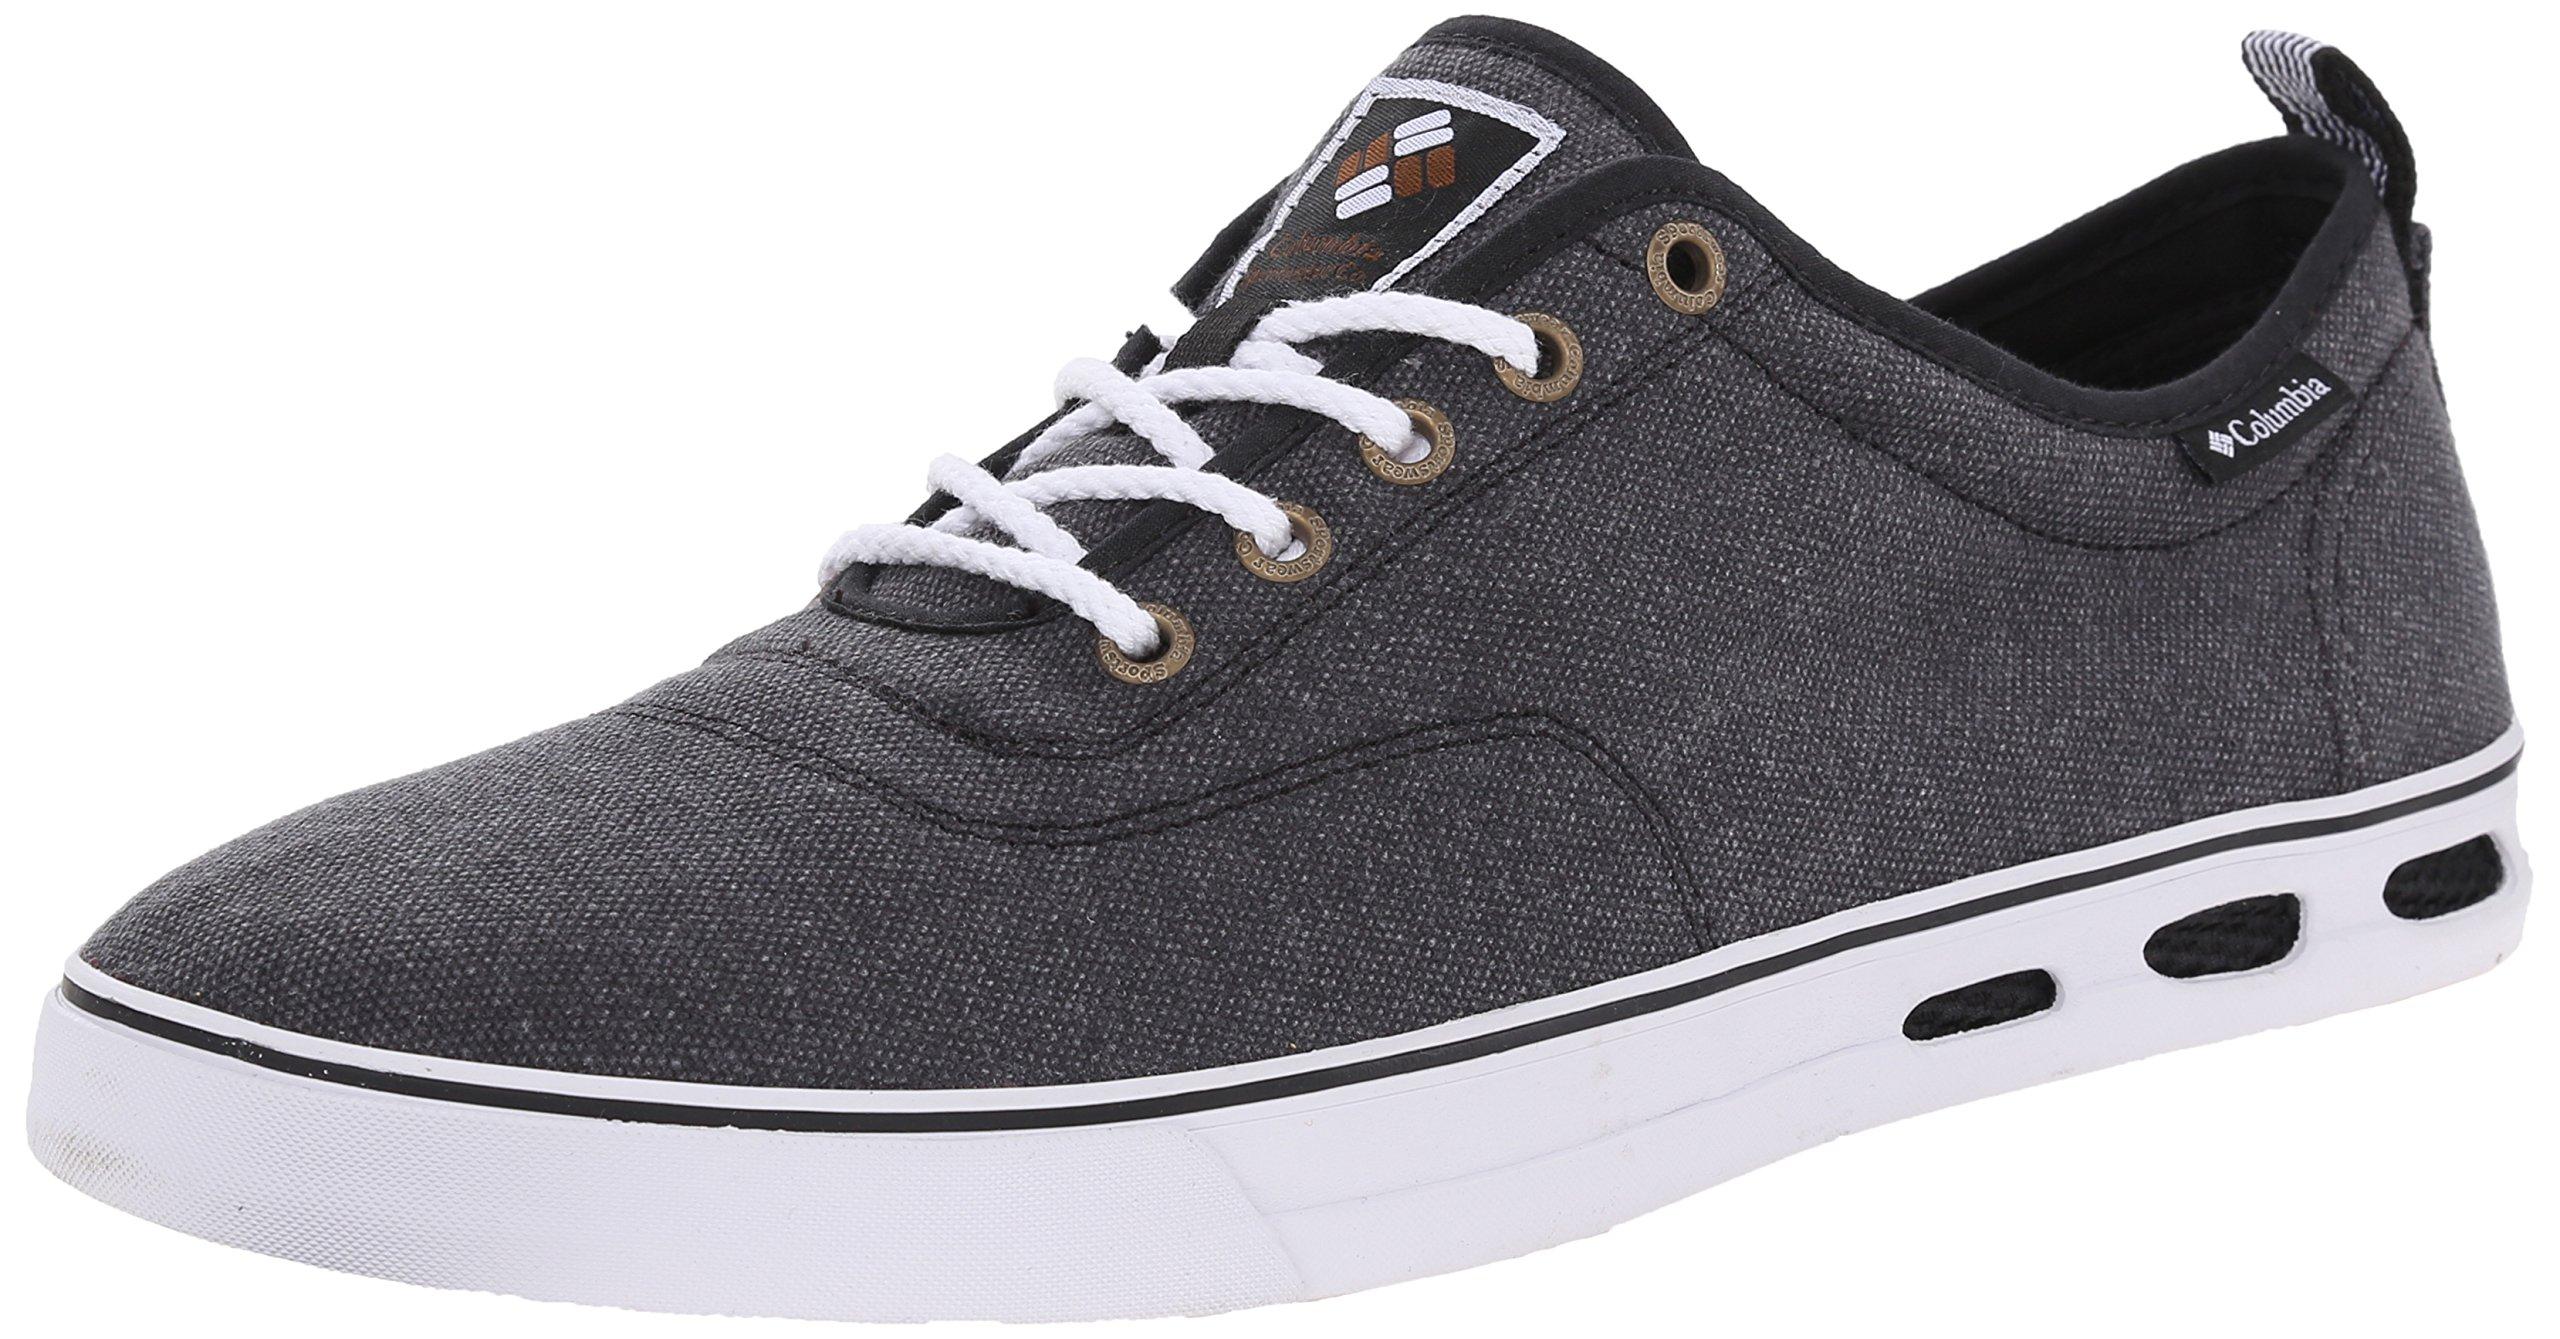 Columbia Men's Vulc N Vent Lace Sneaker